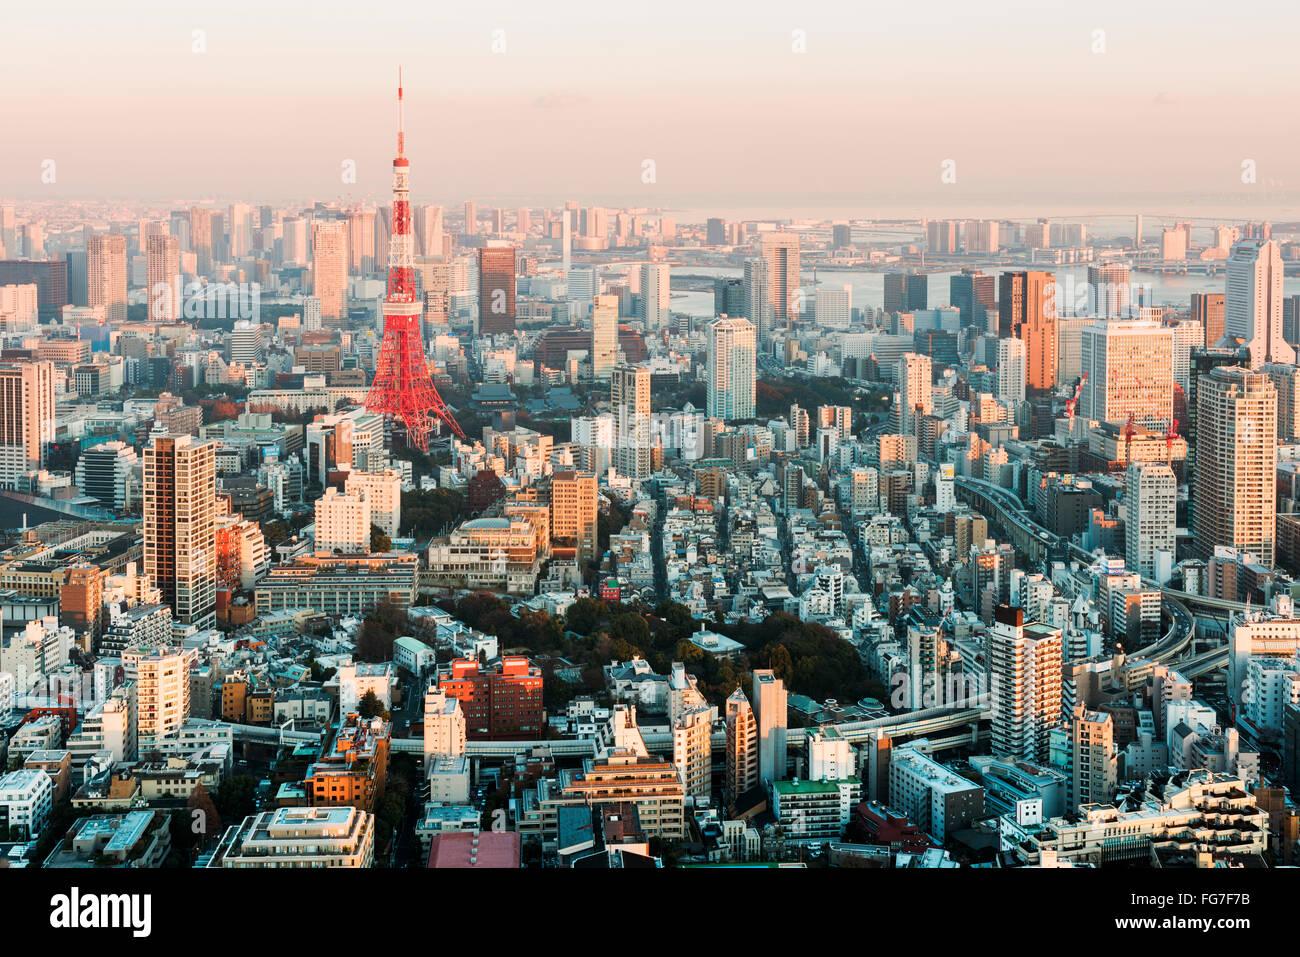 Tokyo, Giappone - 14 Gennaio 2016: Lo skyline di Tokyo al tramonto. Foto Stock